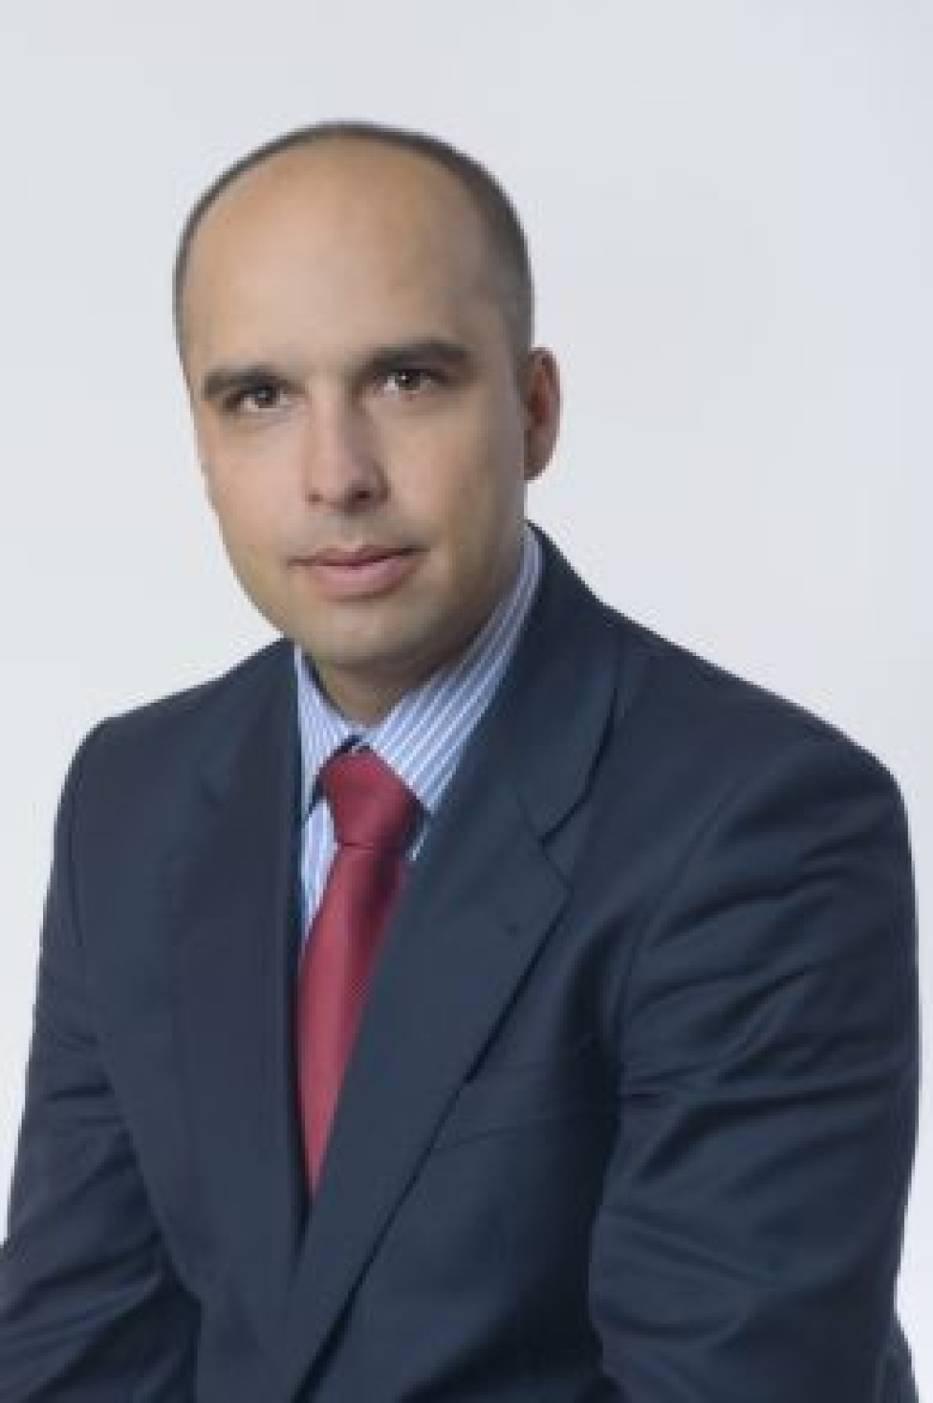 Piotr Kosztyła - 52b8510e527c6_o,size,933x0,q,70,h,f08fda